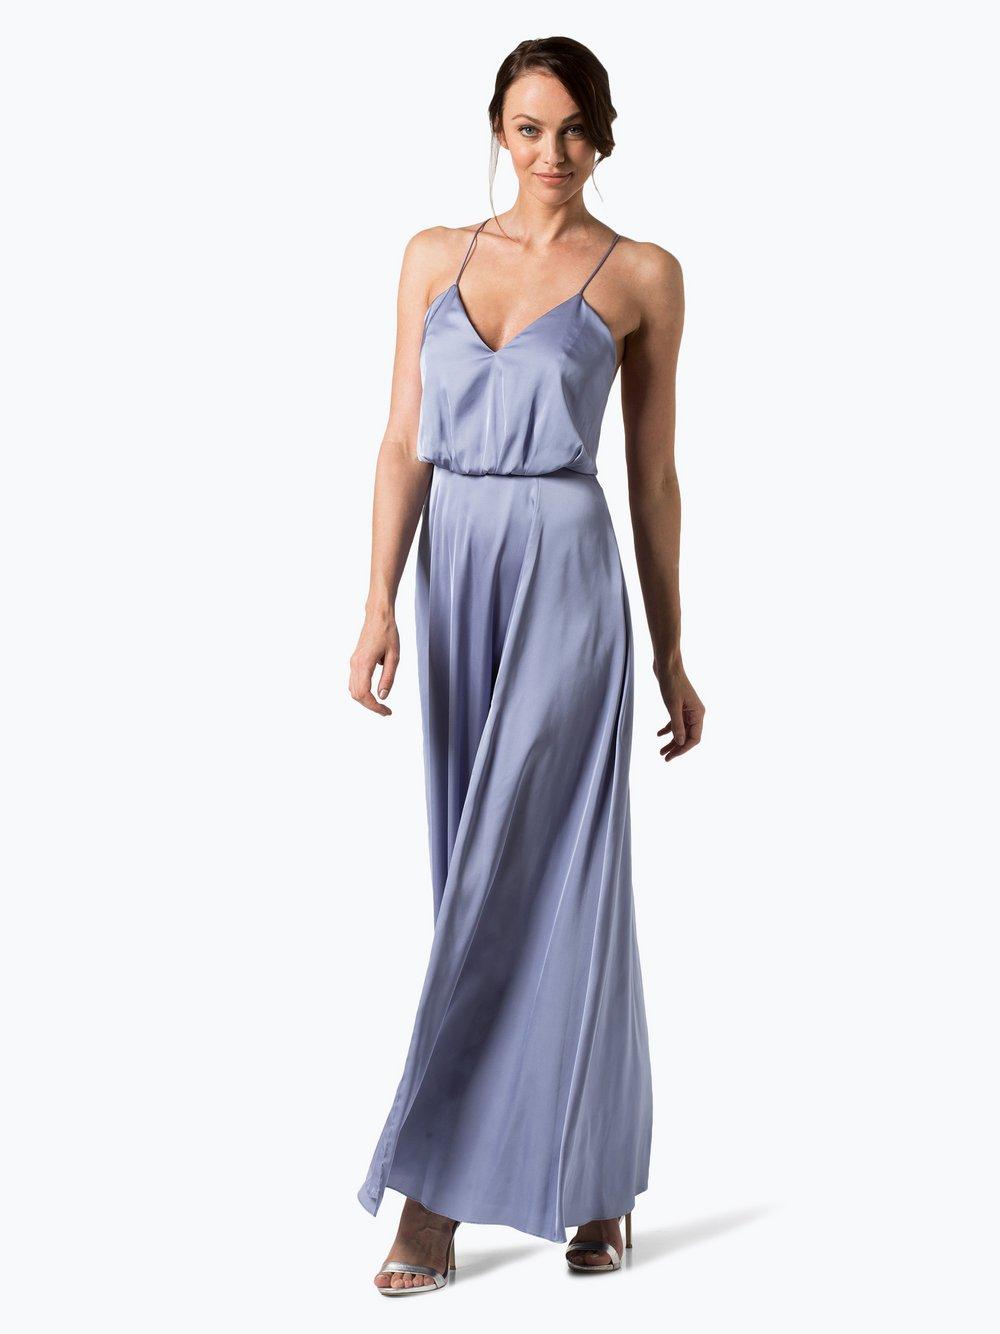 Damen abendkleid blau